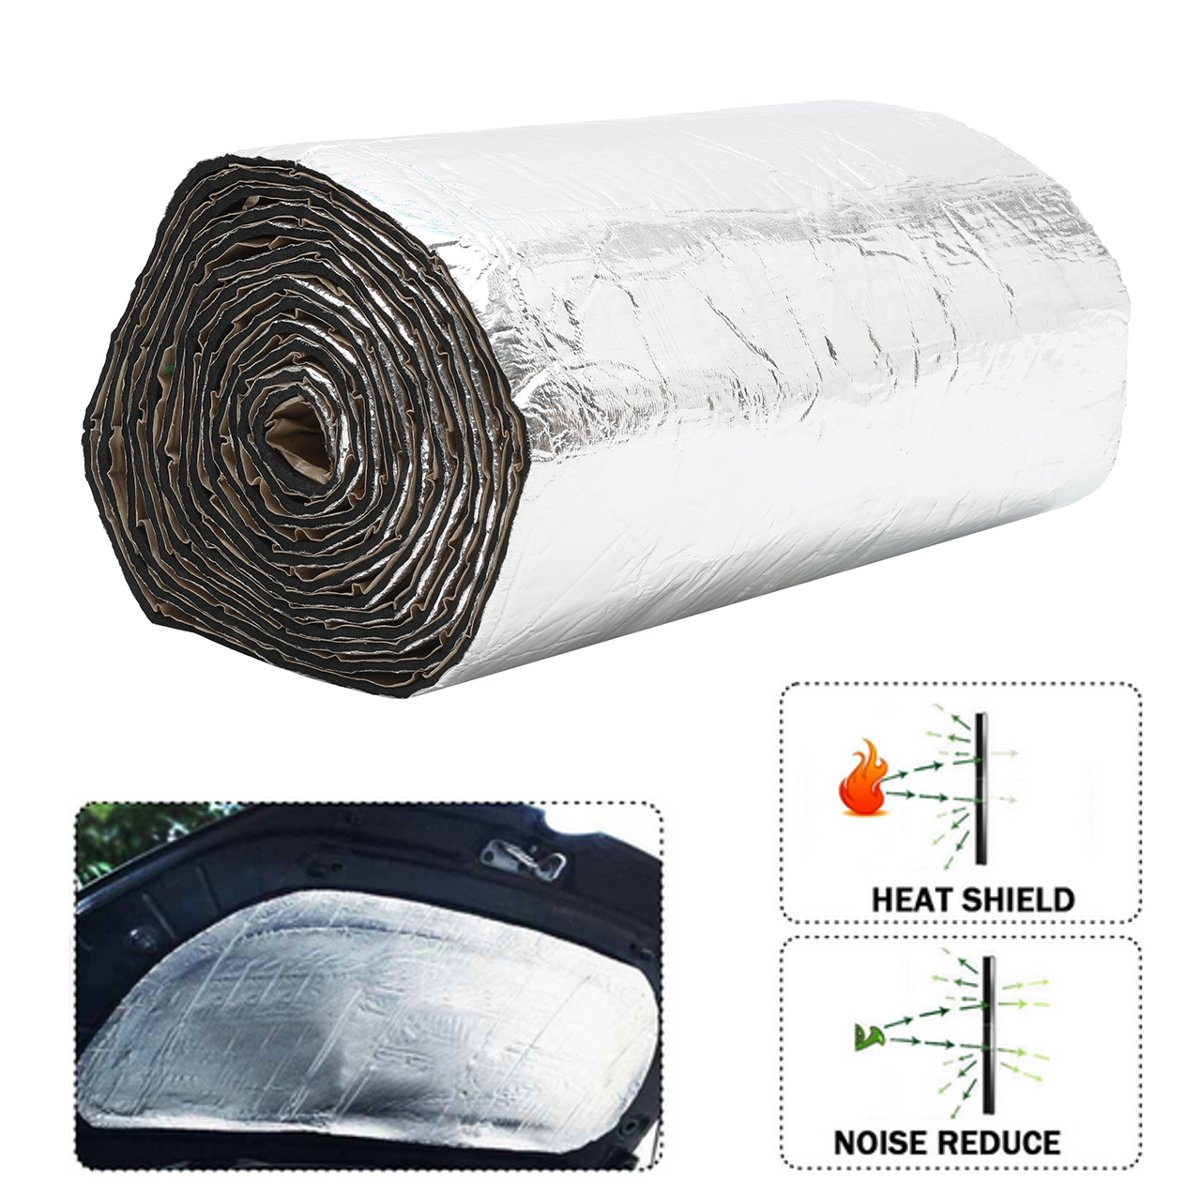 Bonnet Insulation Soundproofing GlassMAT High Temperature 1m x 3m 10mm Reflective Engine Bay Thermal Acoustic Insulation Sound Proofing Foam